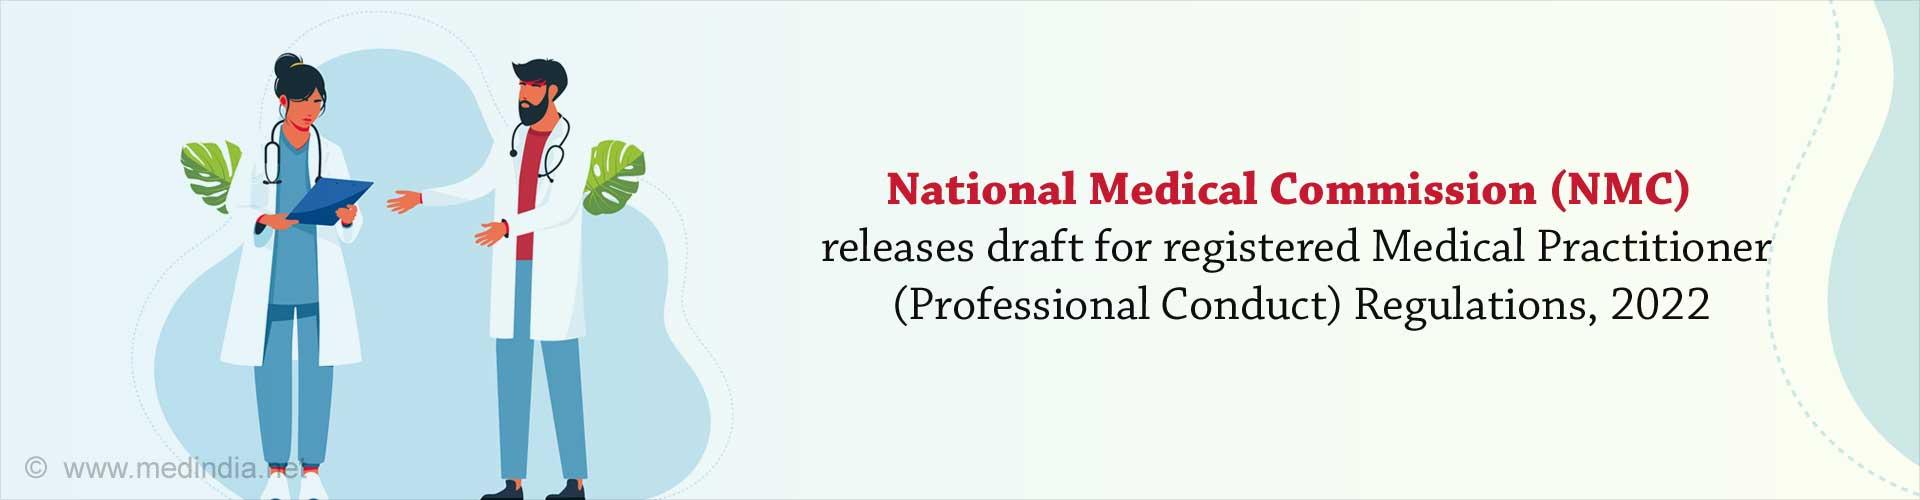 Lok Sabha Passes National Medical Commission (NMC) Bill 2019